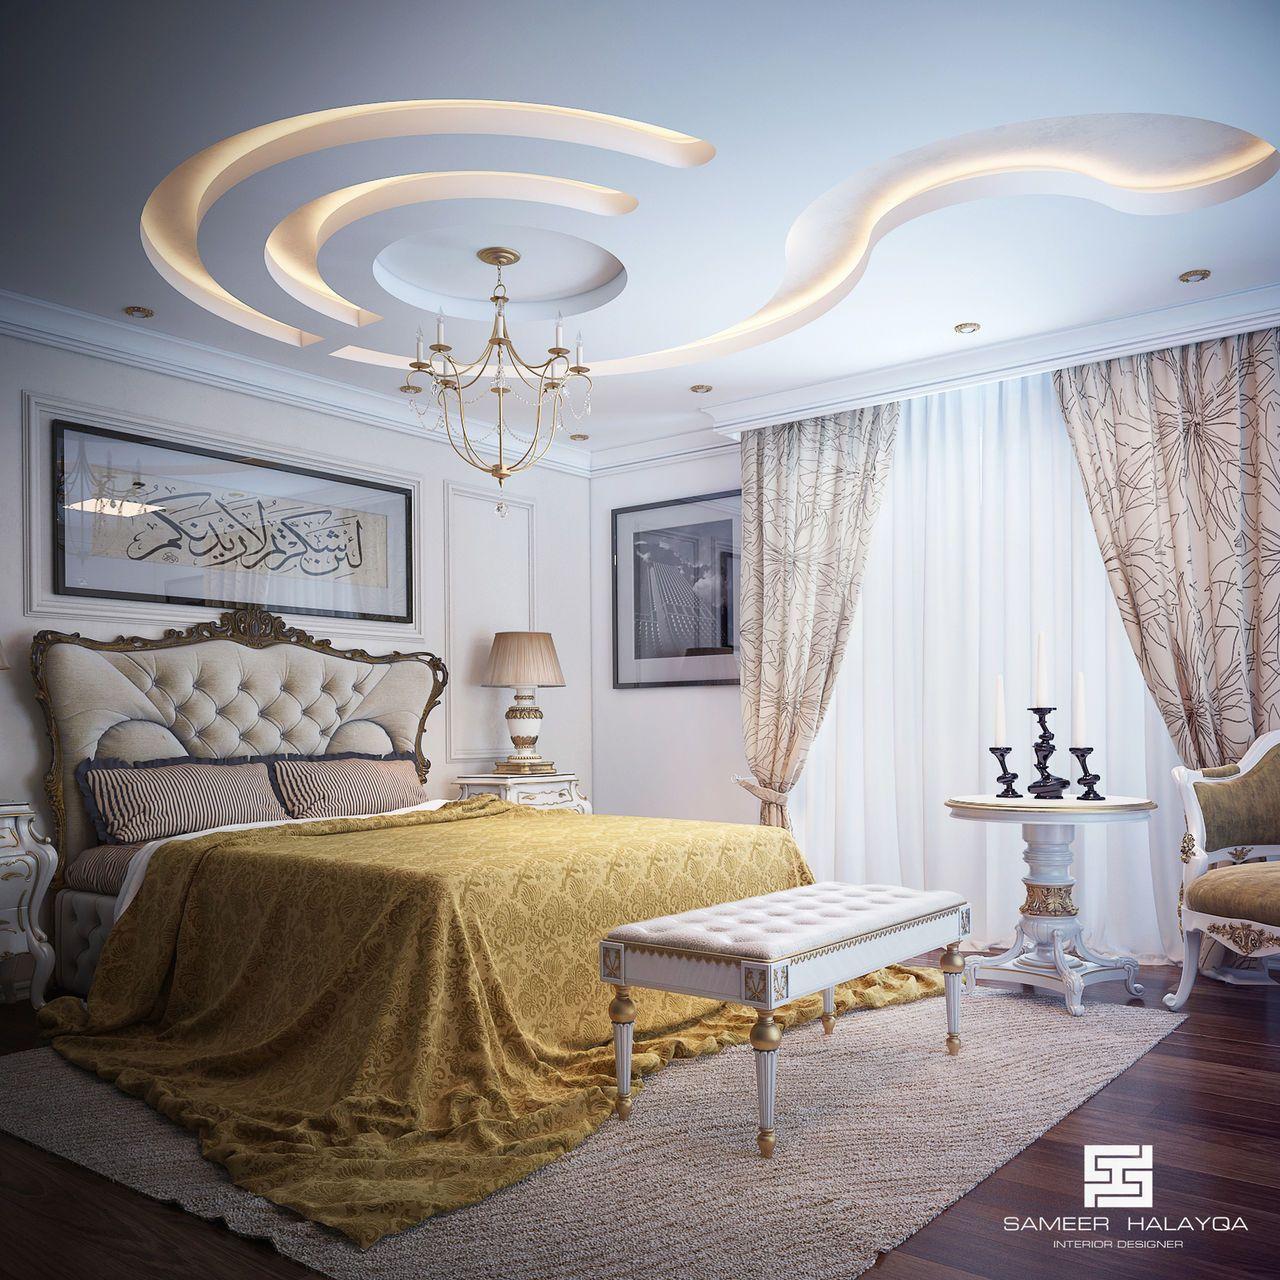 Contemporary Mediterranean Luxury Interior Designs: Contemporary Mediterranean Master Bedroom